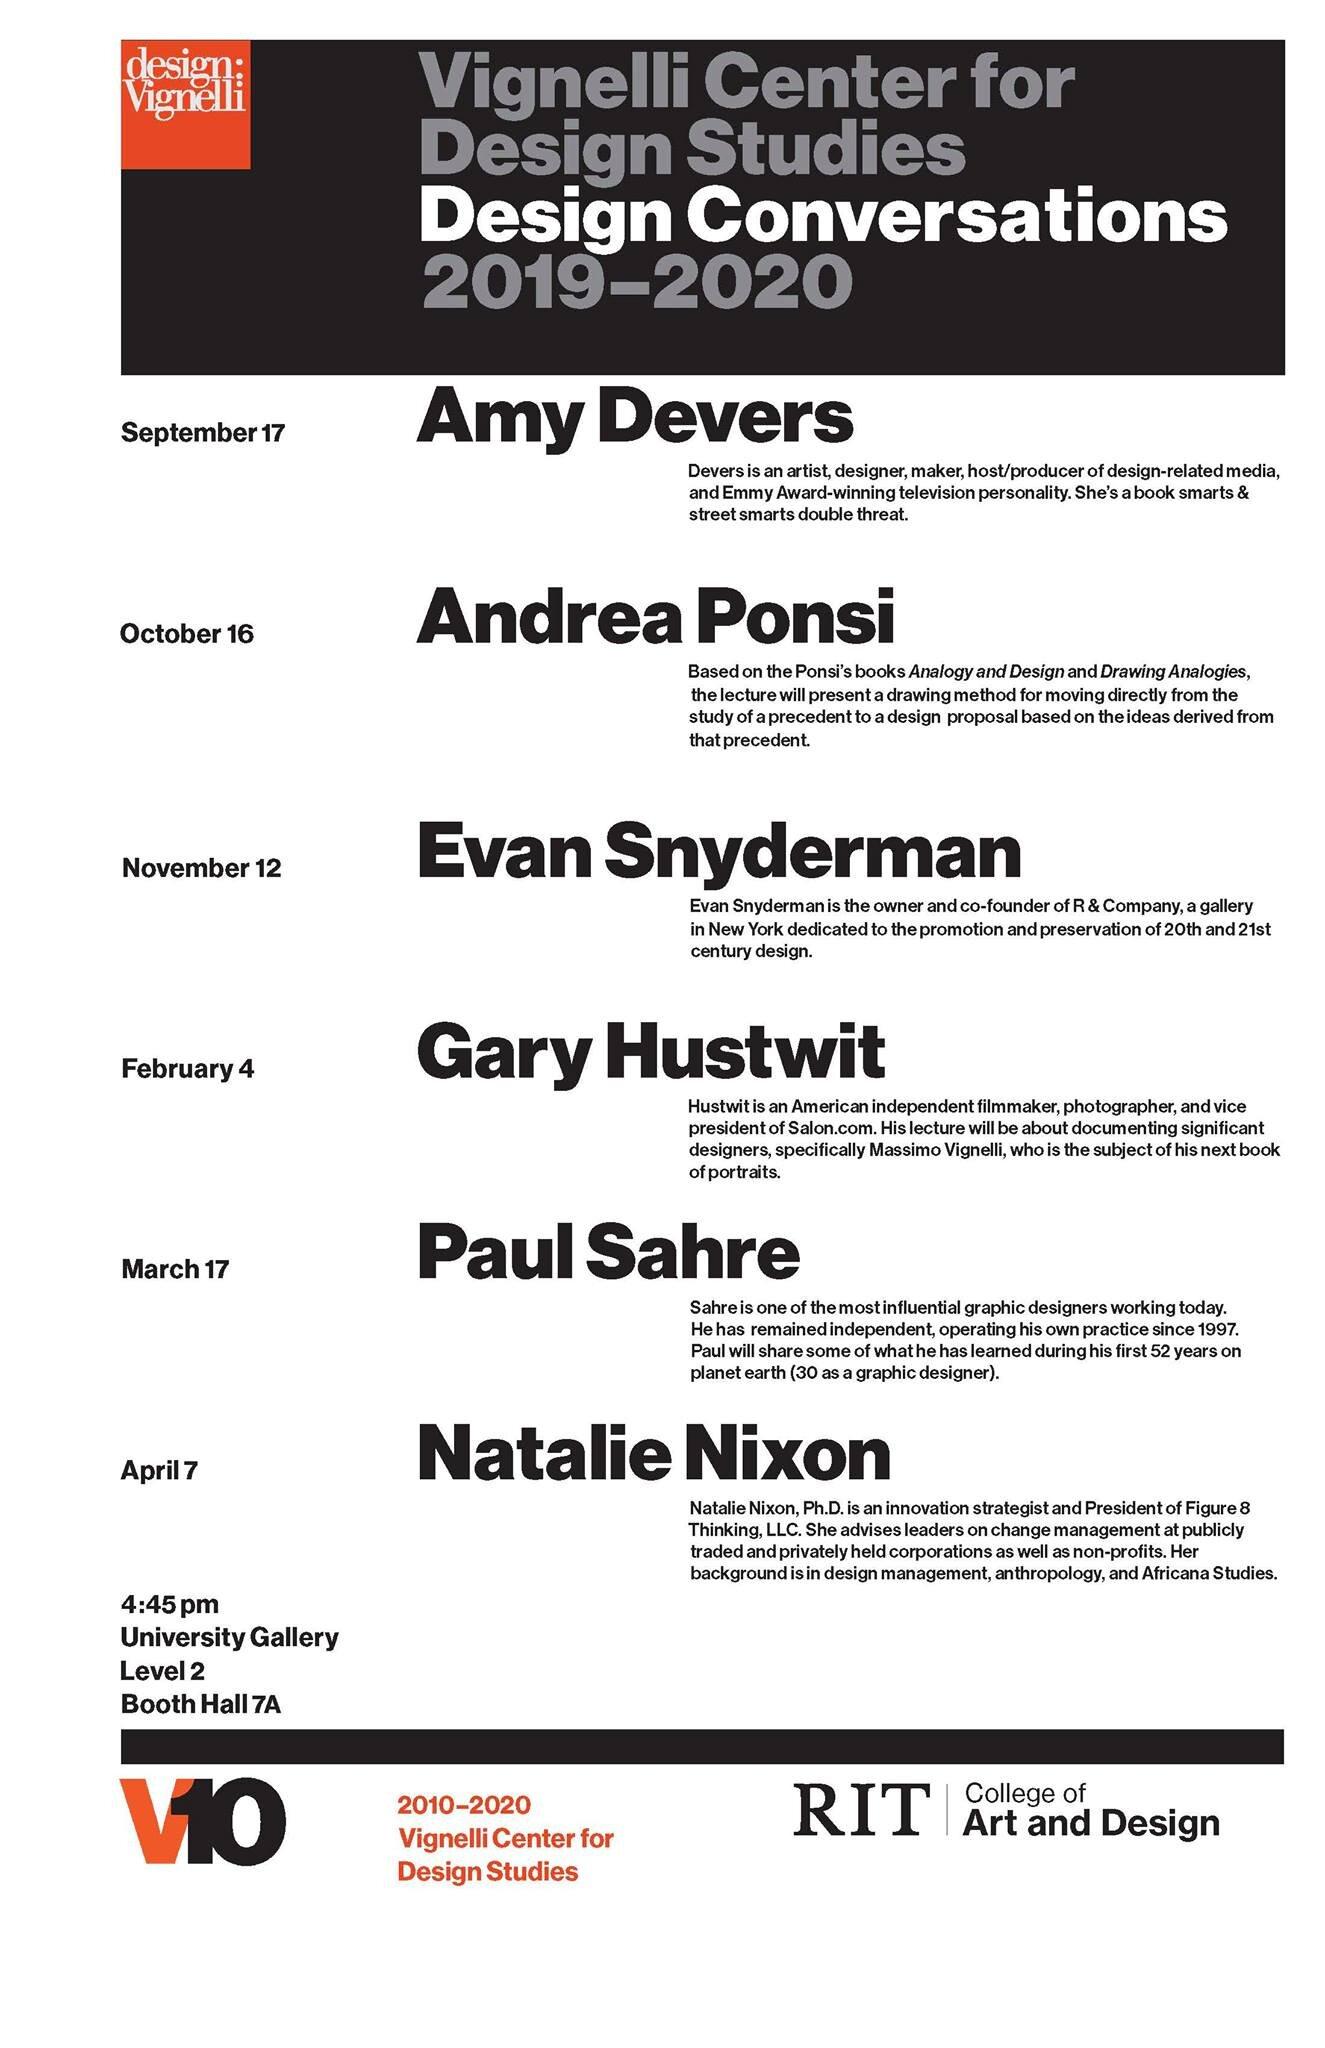 Vignelli Center for Design Studies_Design Conversations 2019-2020